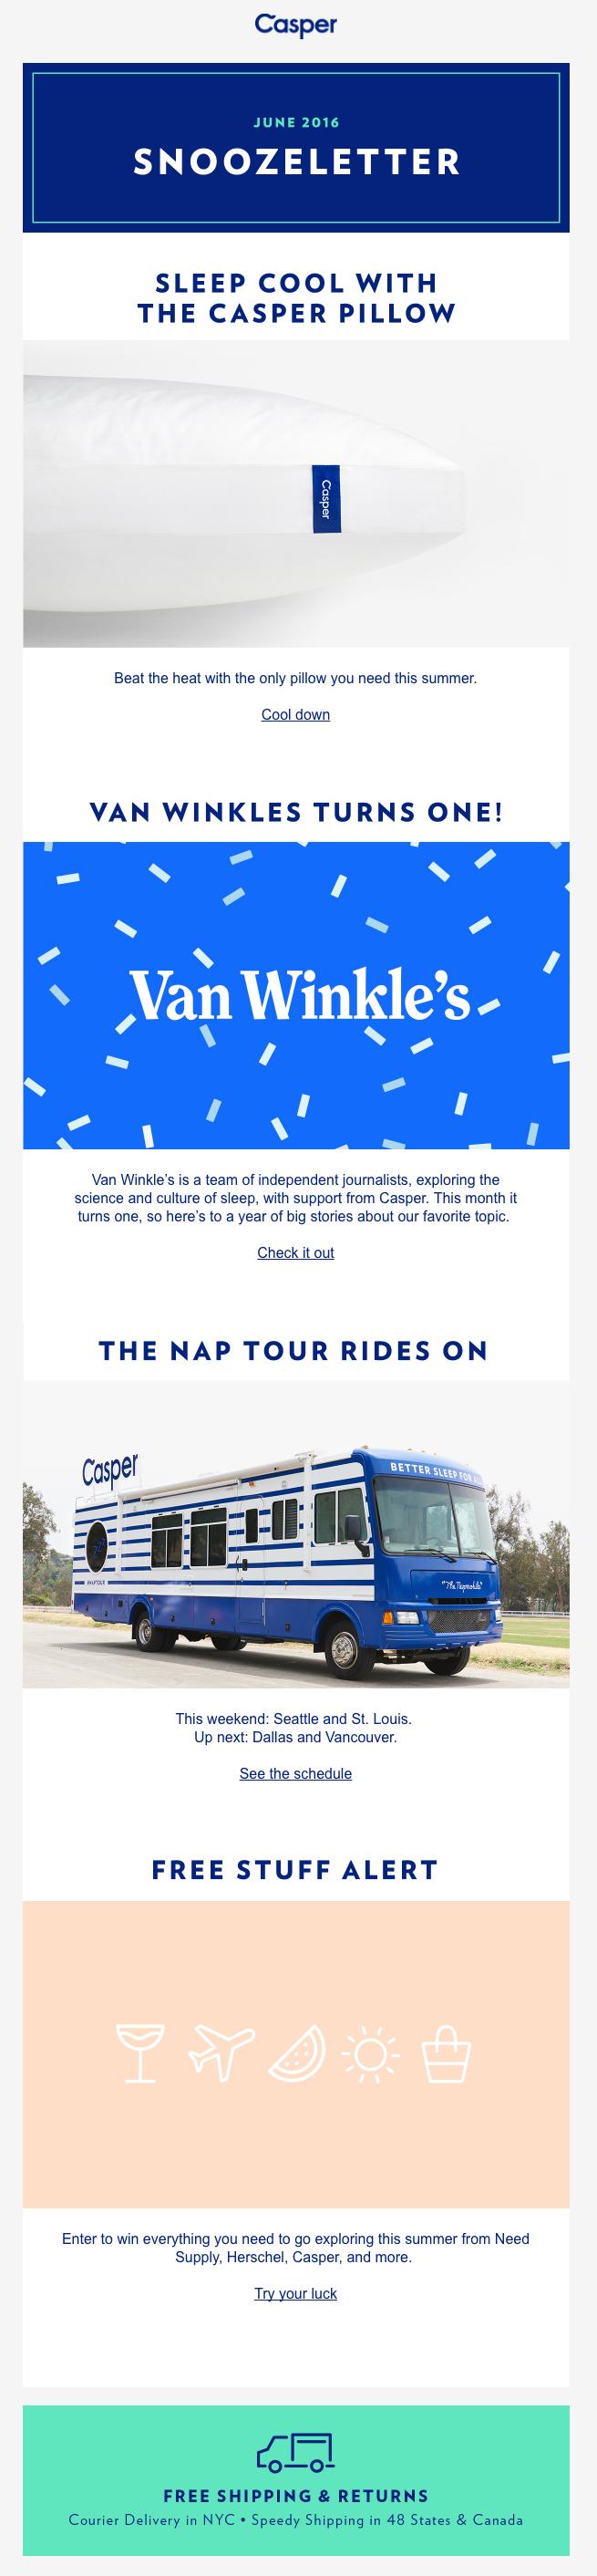 Casper email design trends